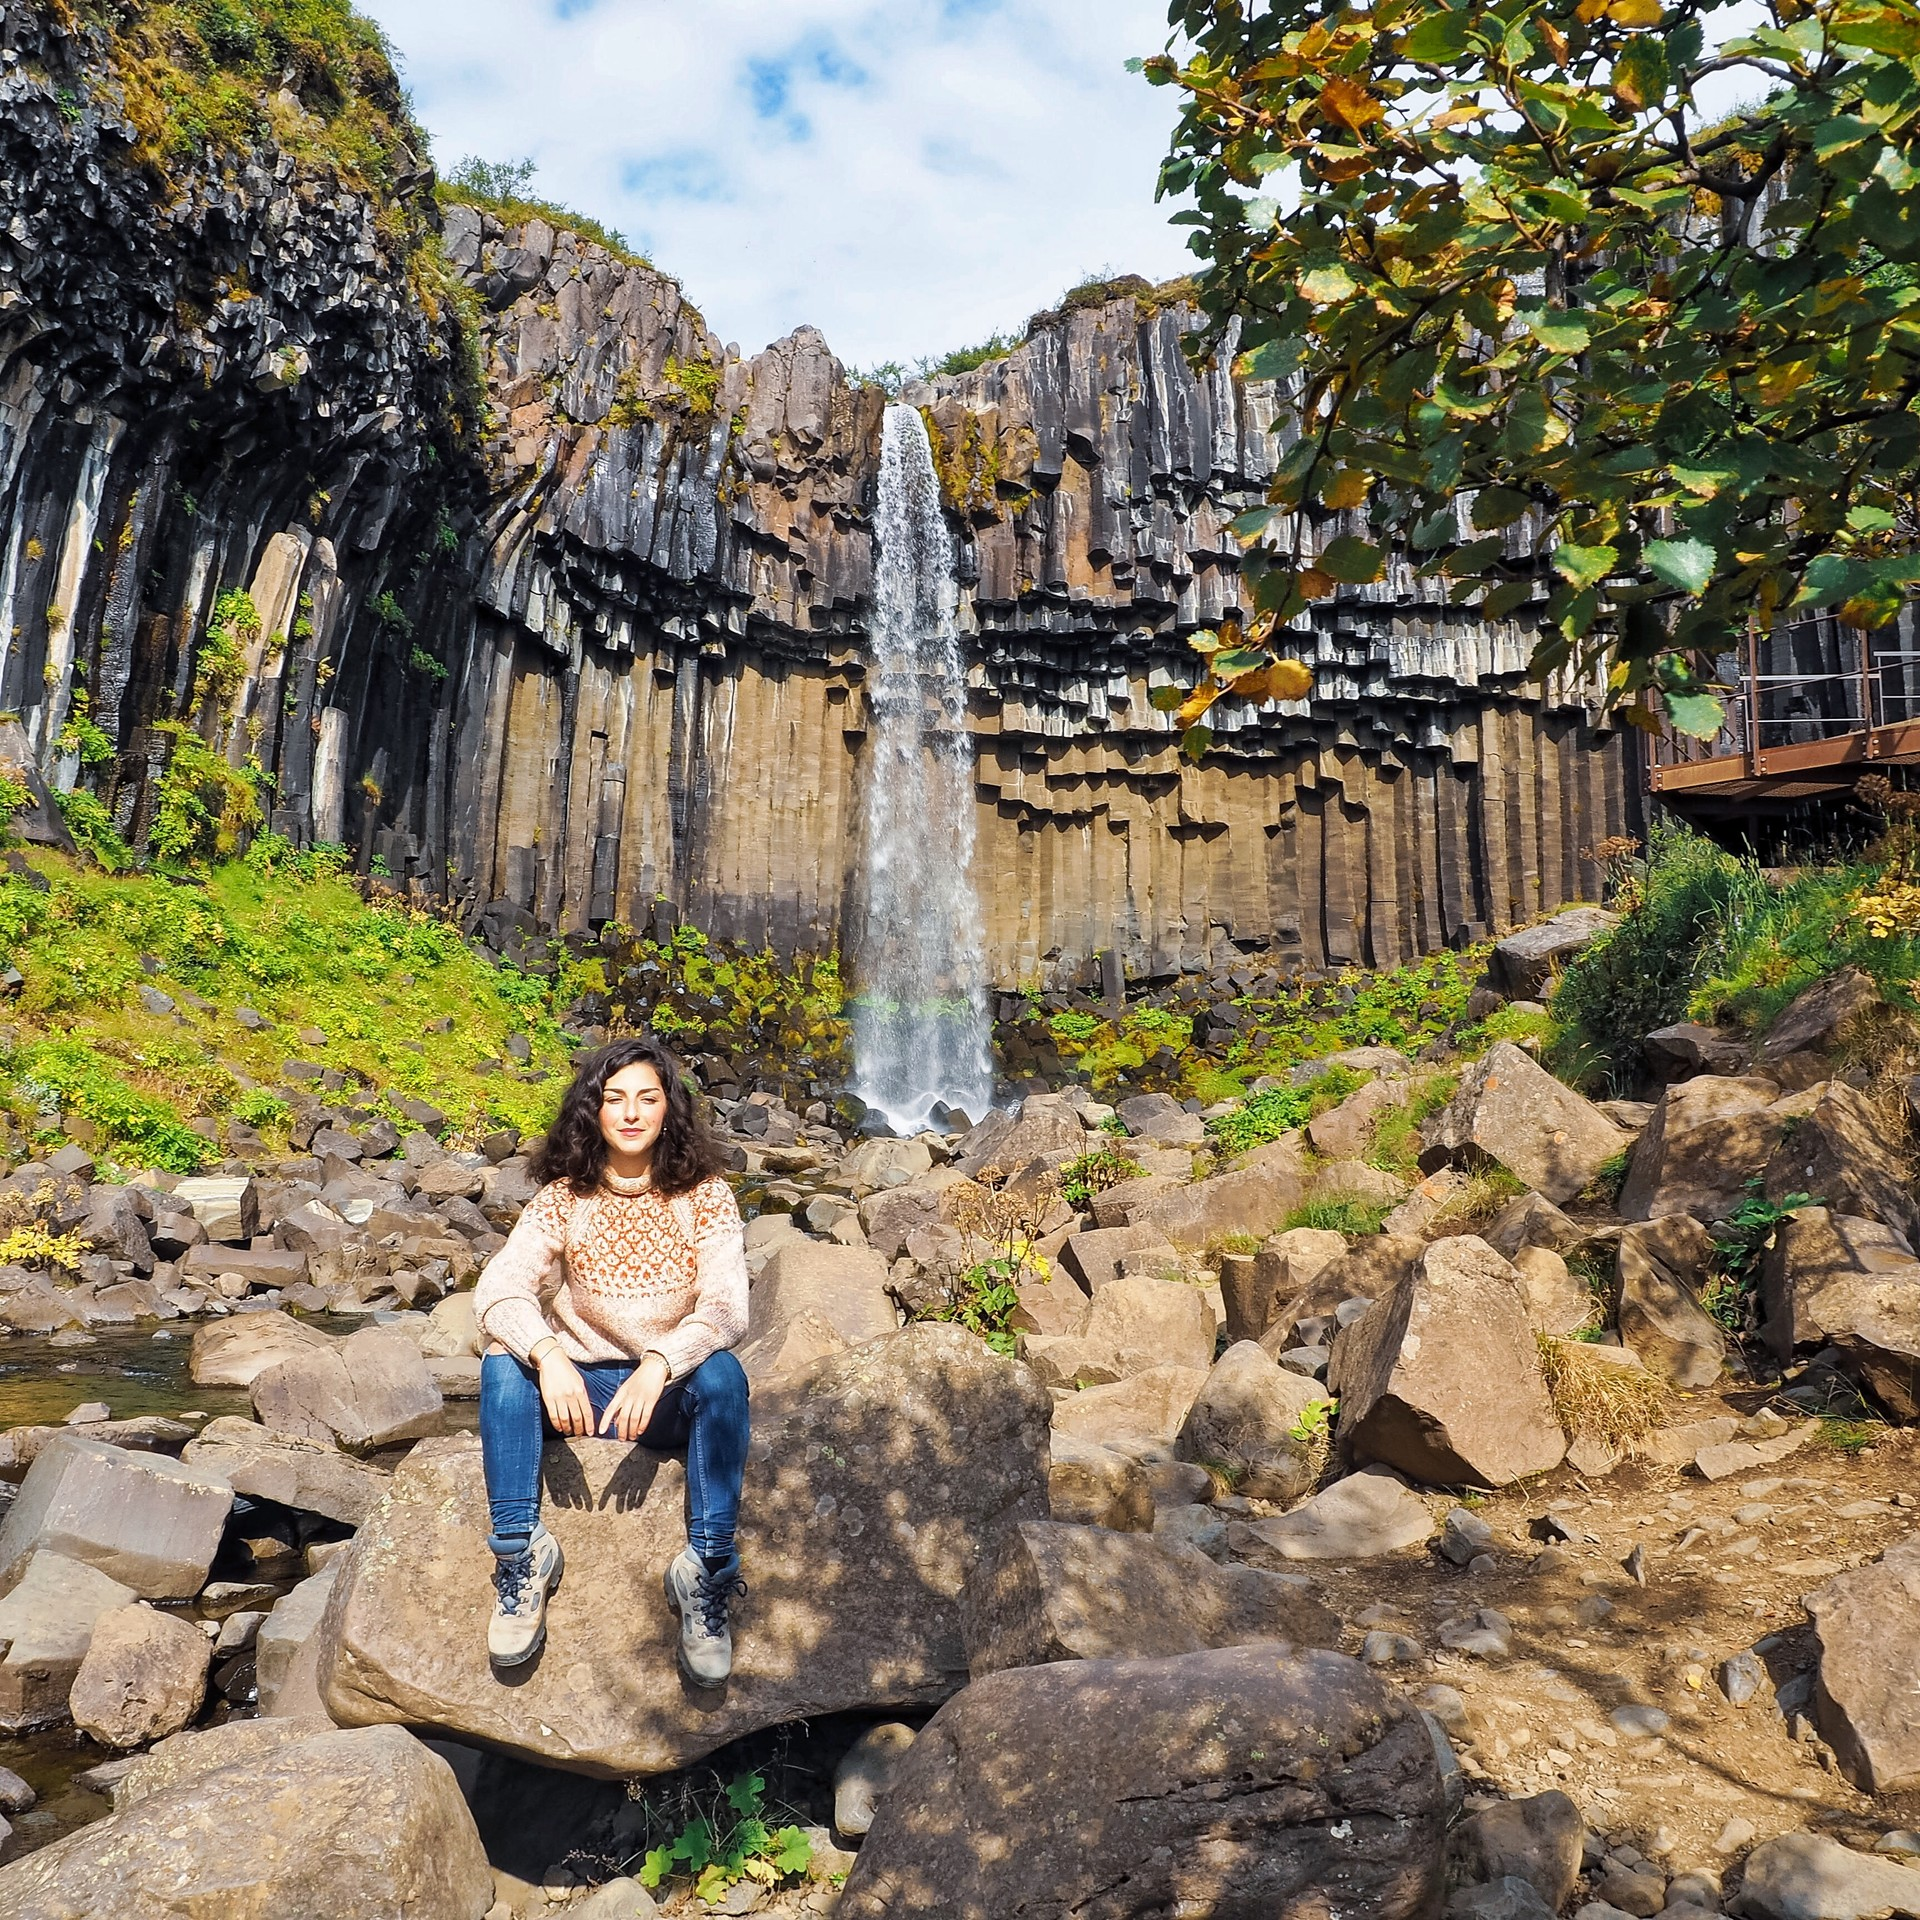 La cascade de Svartifoss